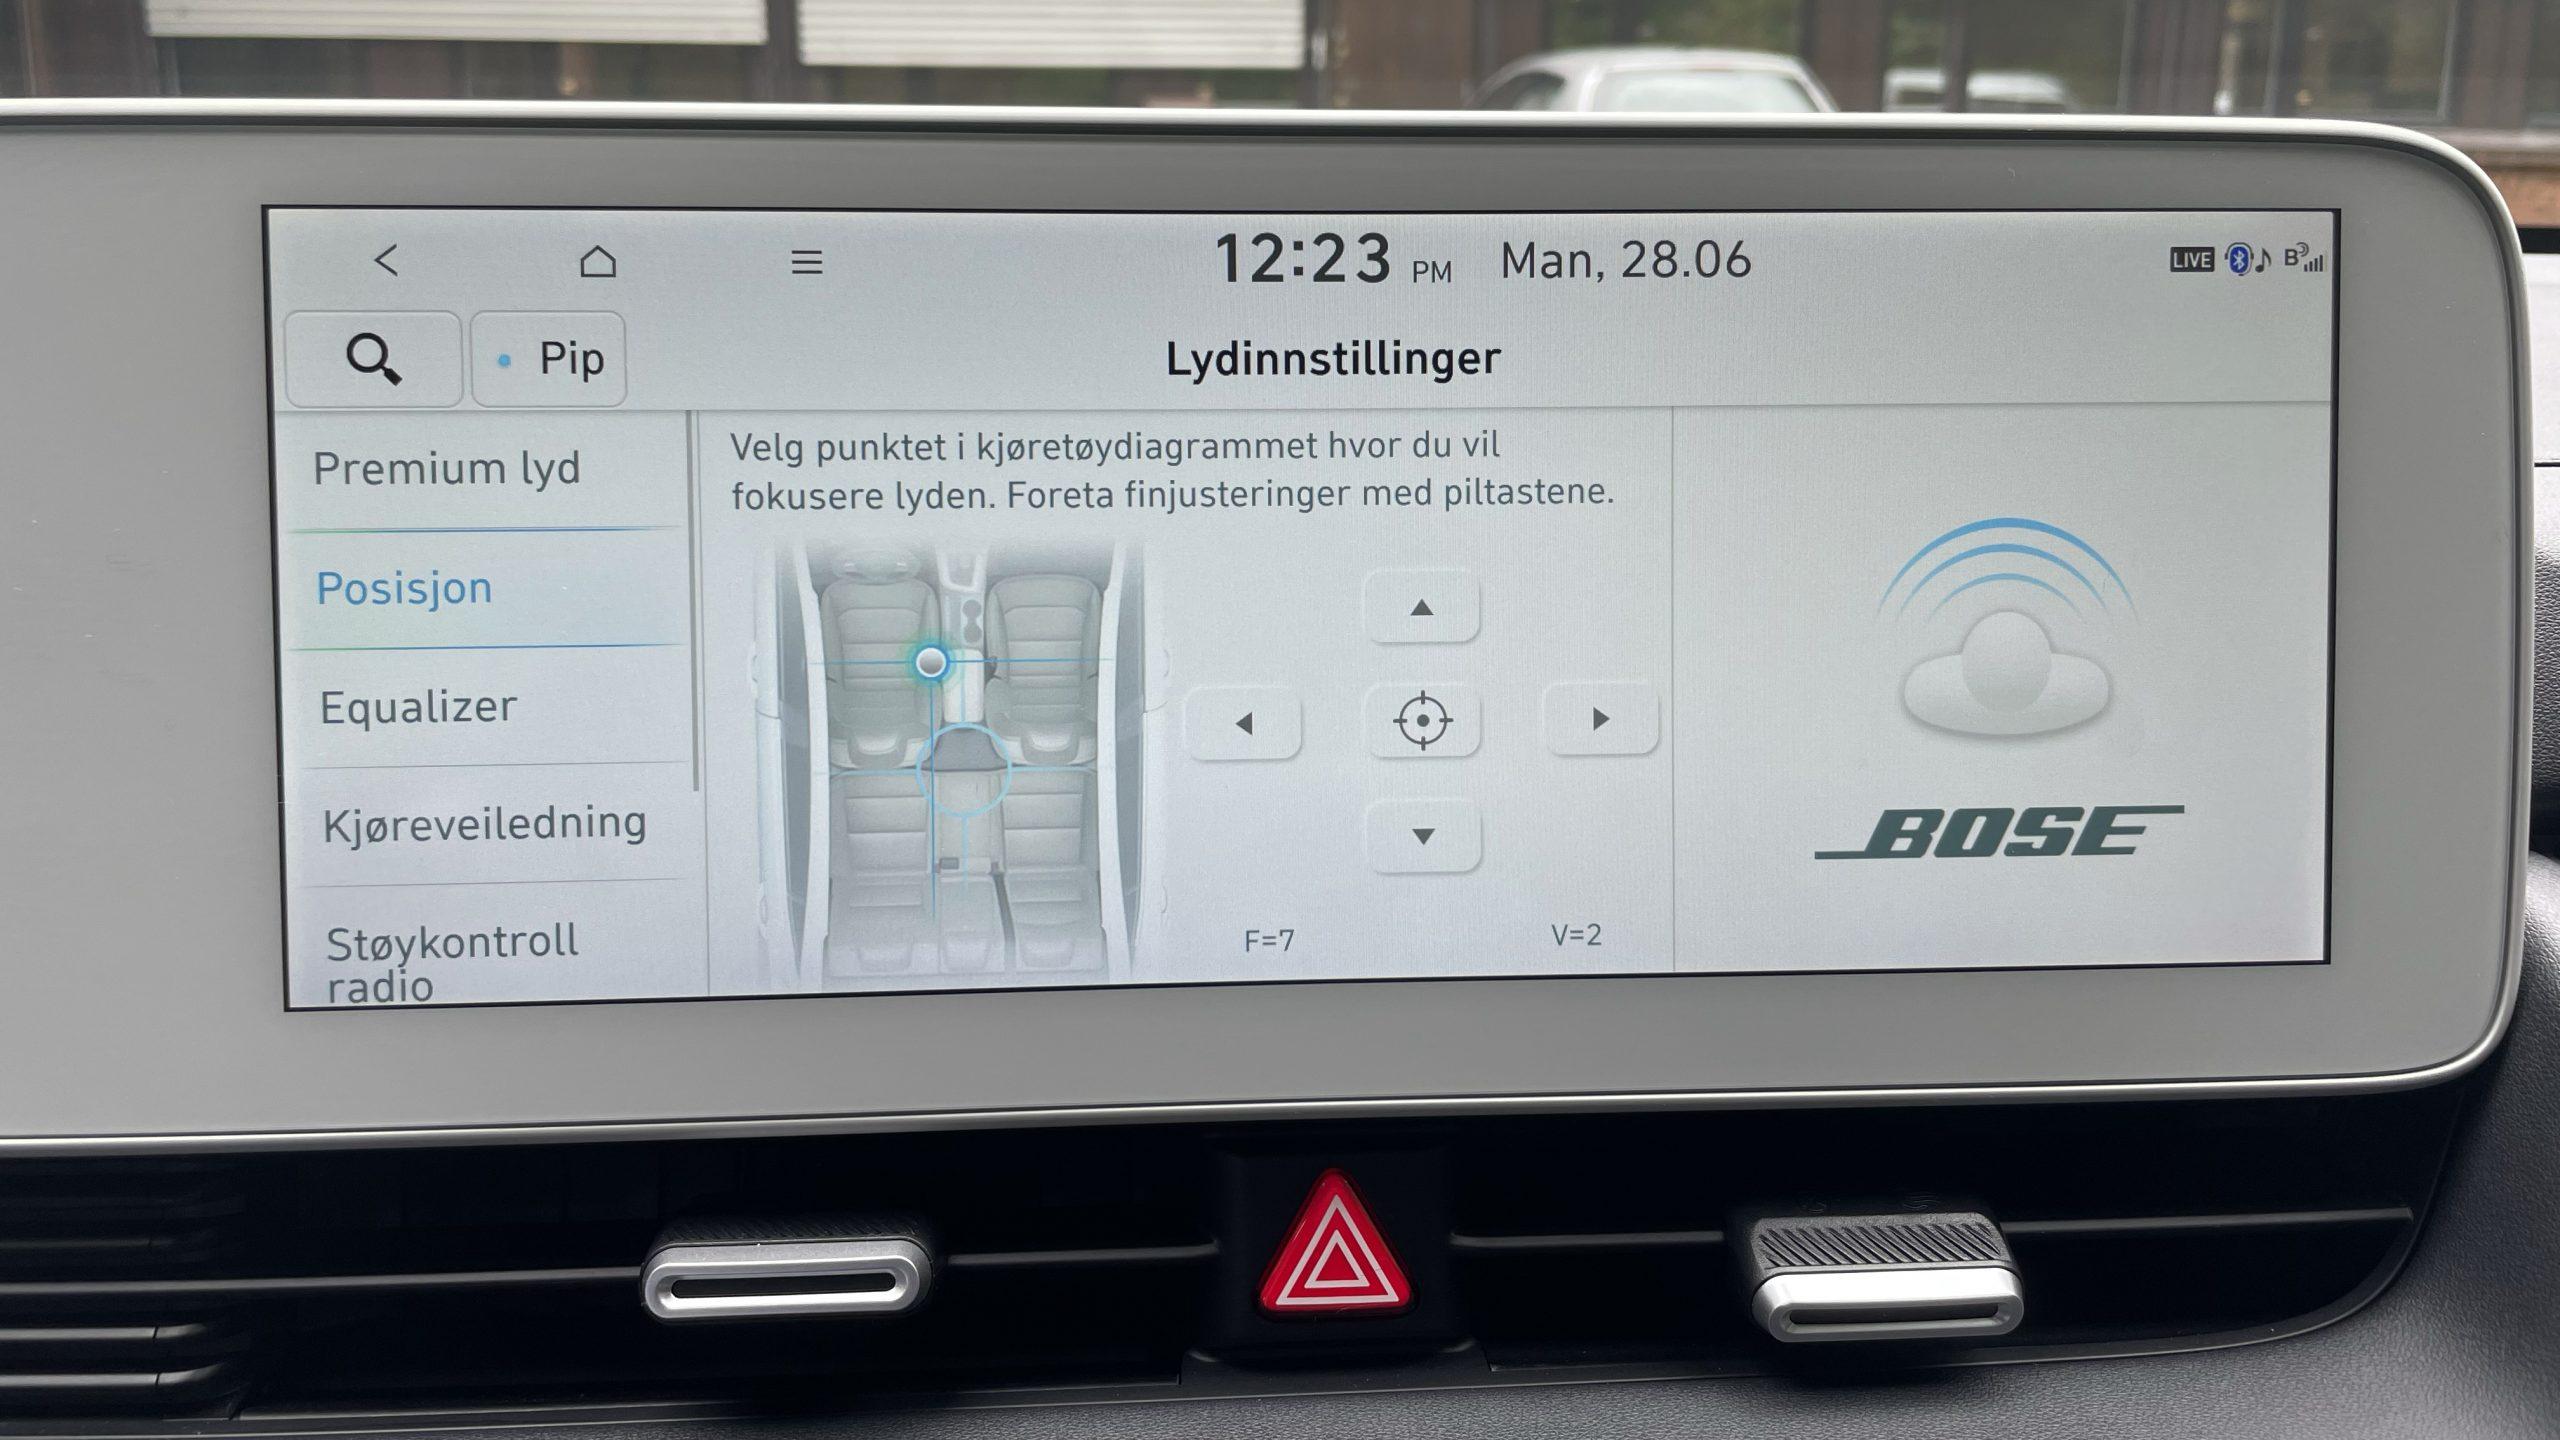 Hyundai Ioniq 5 Bose settings